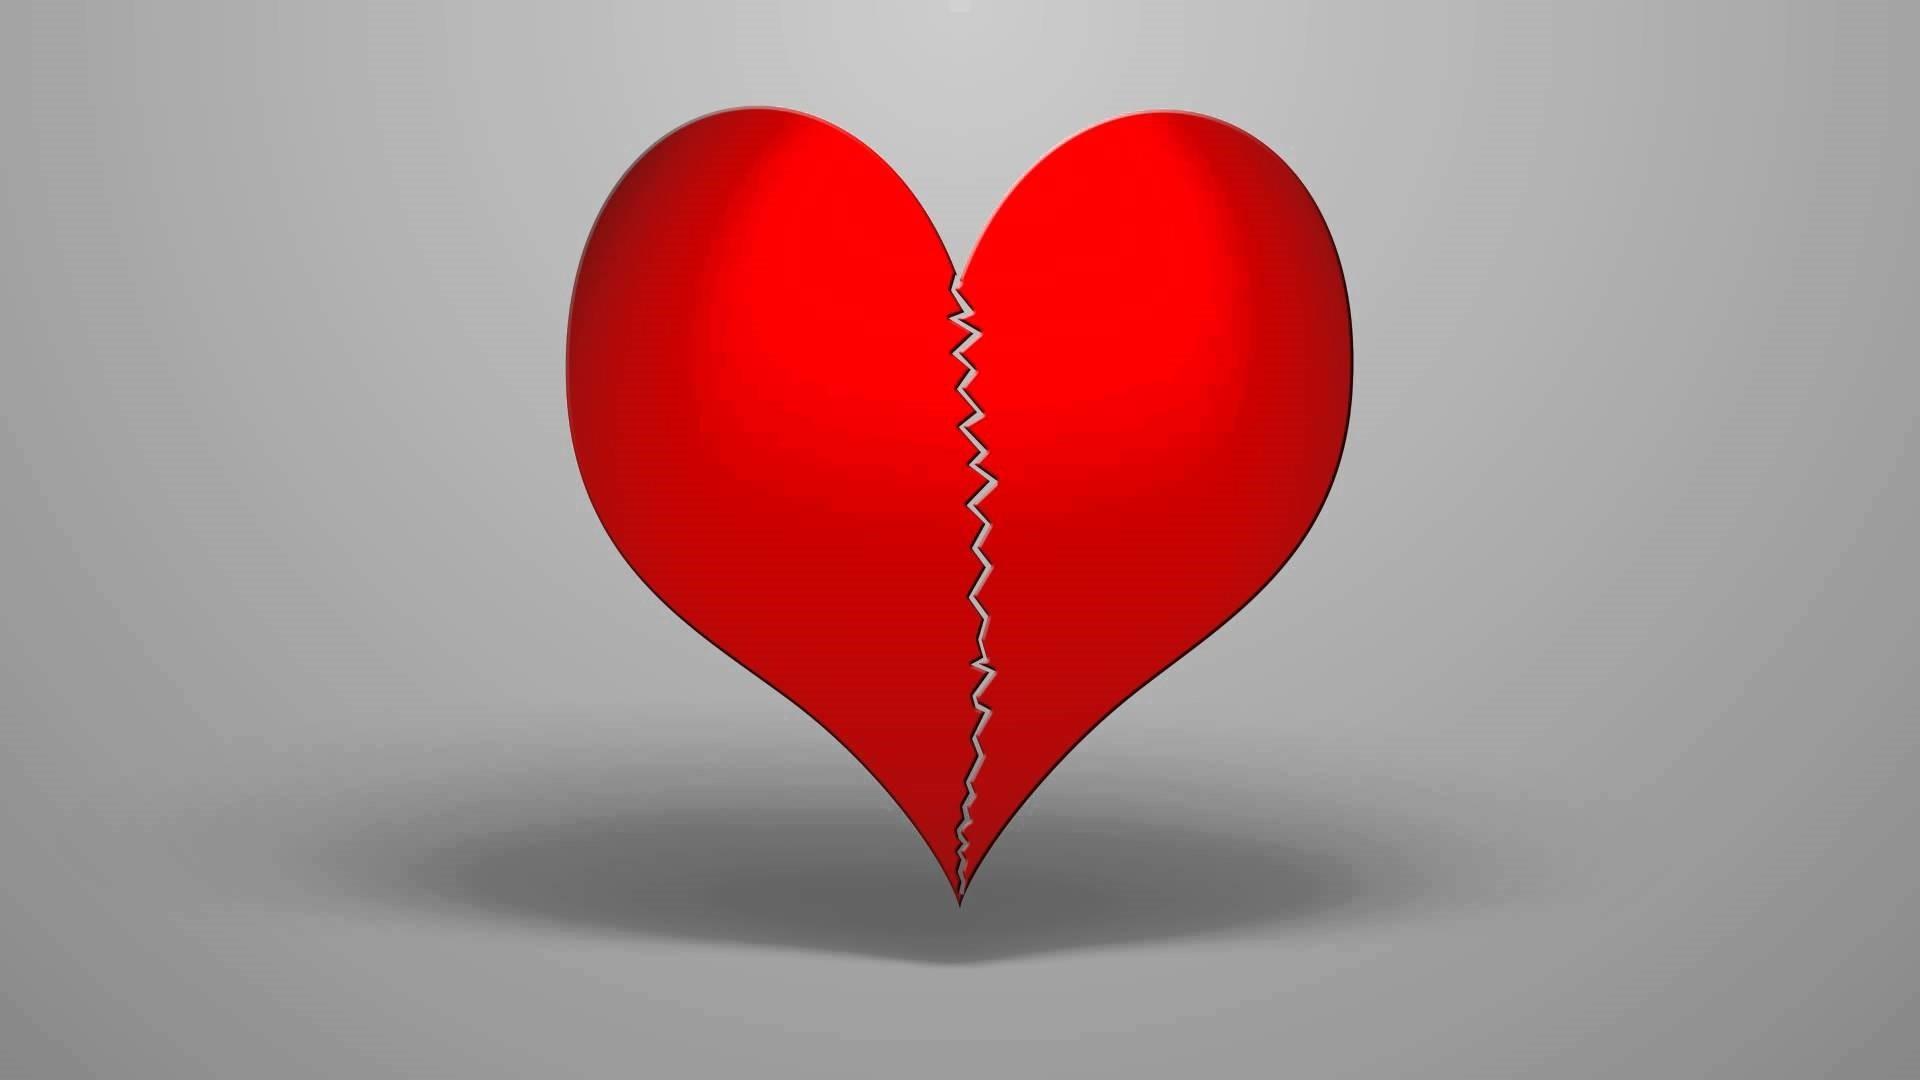 Broken Heart hd desktop wallpaper